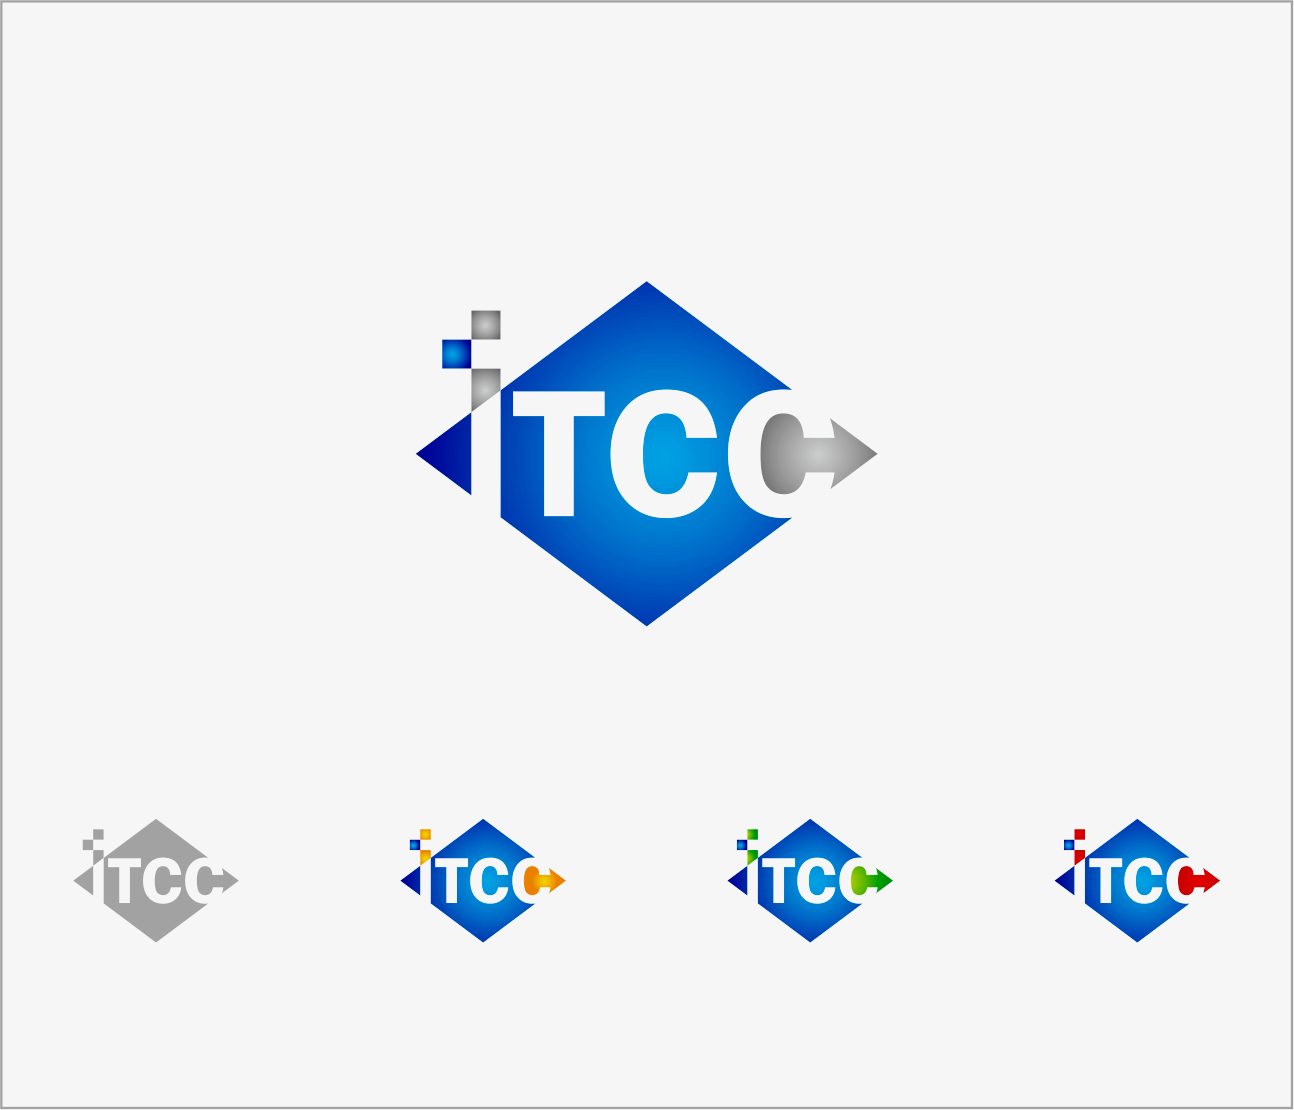 Logo Design by Armada Jamaluddin - Entry No. 118 in the Logo Design Contest Inspiring Logo Design for ITCC.